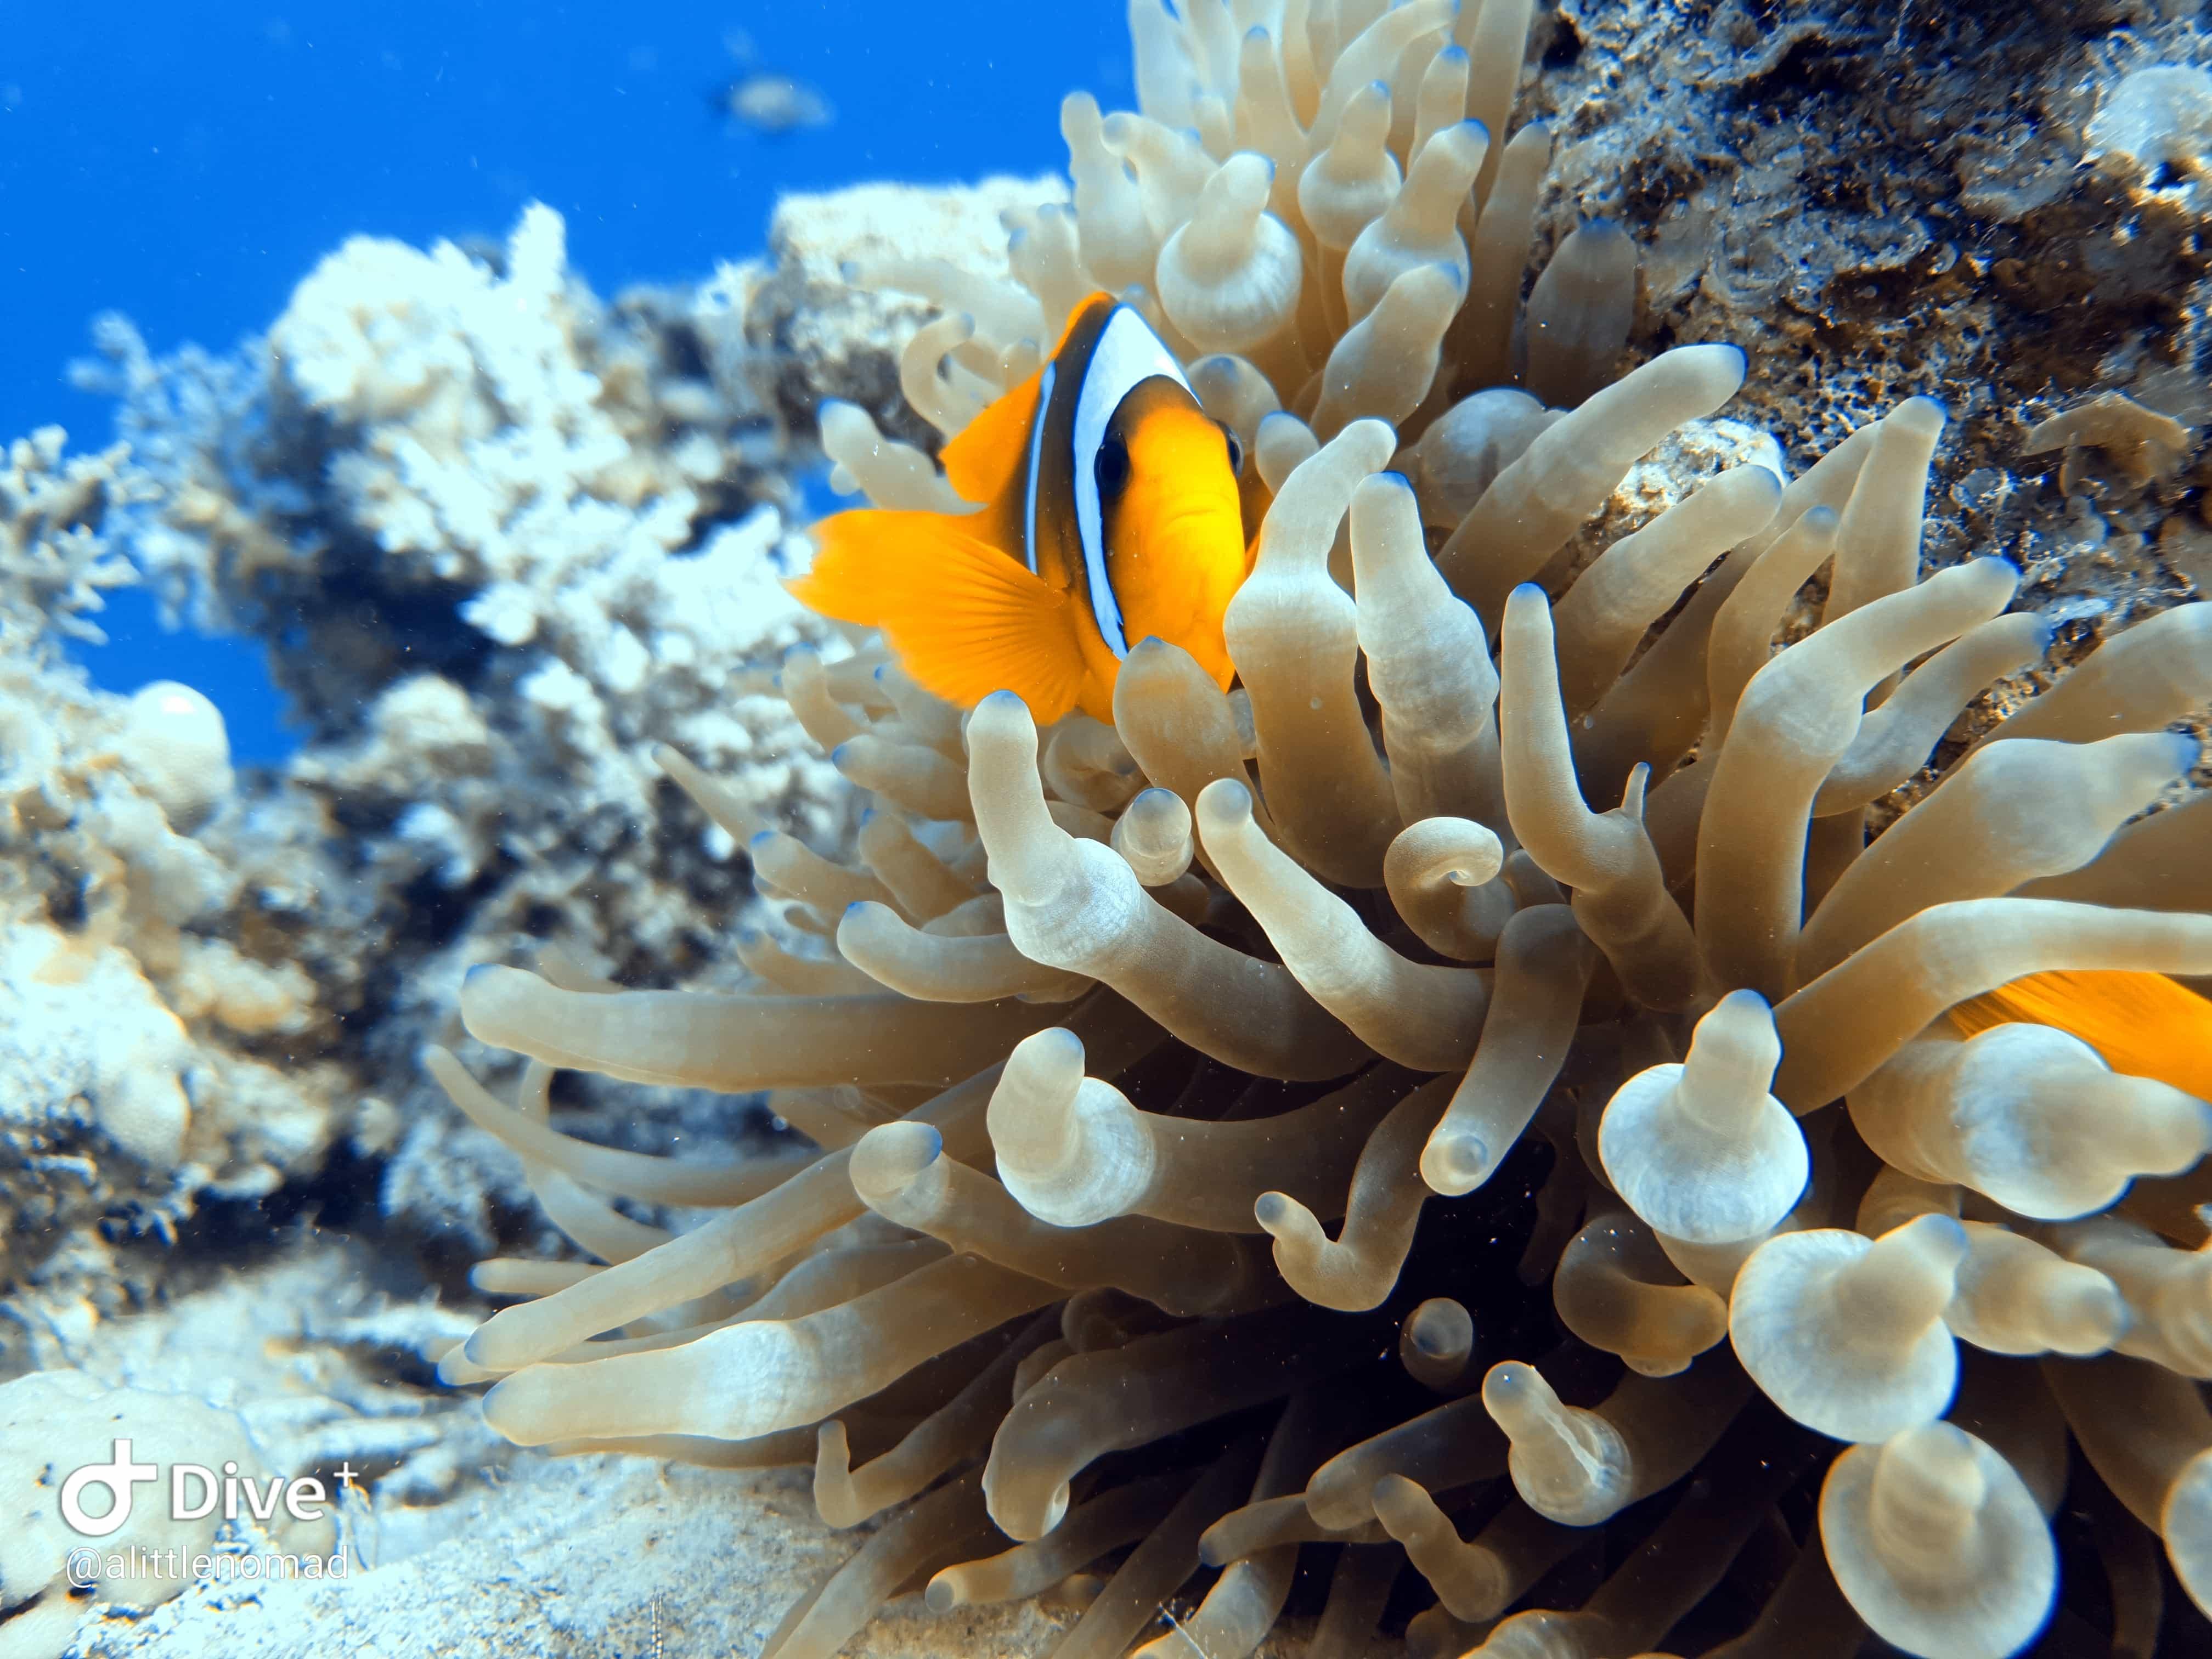 Sharm-el-Sheikh - Diving Guide